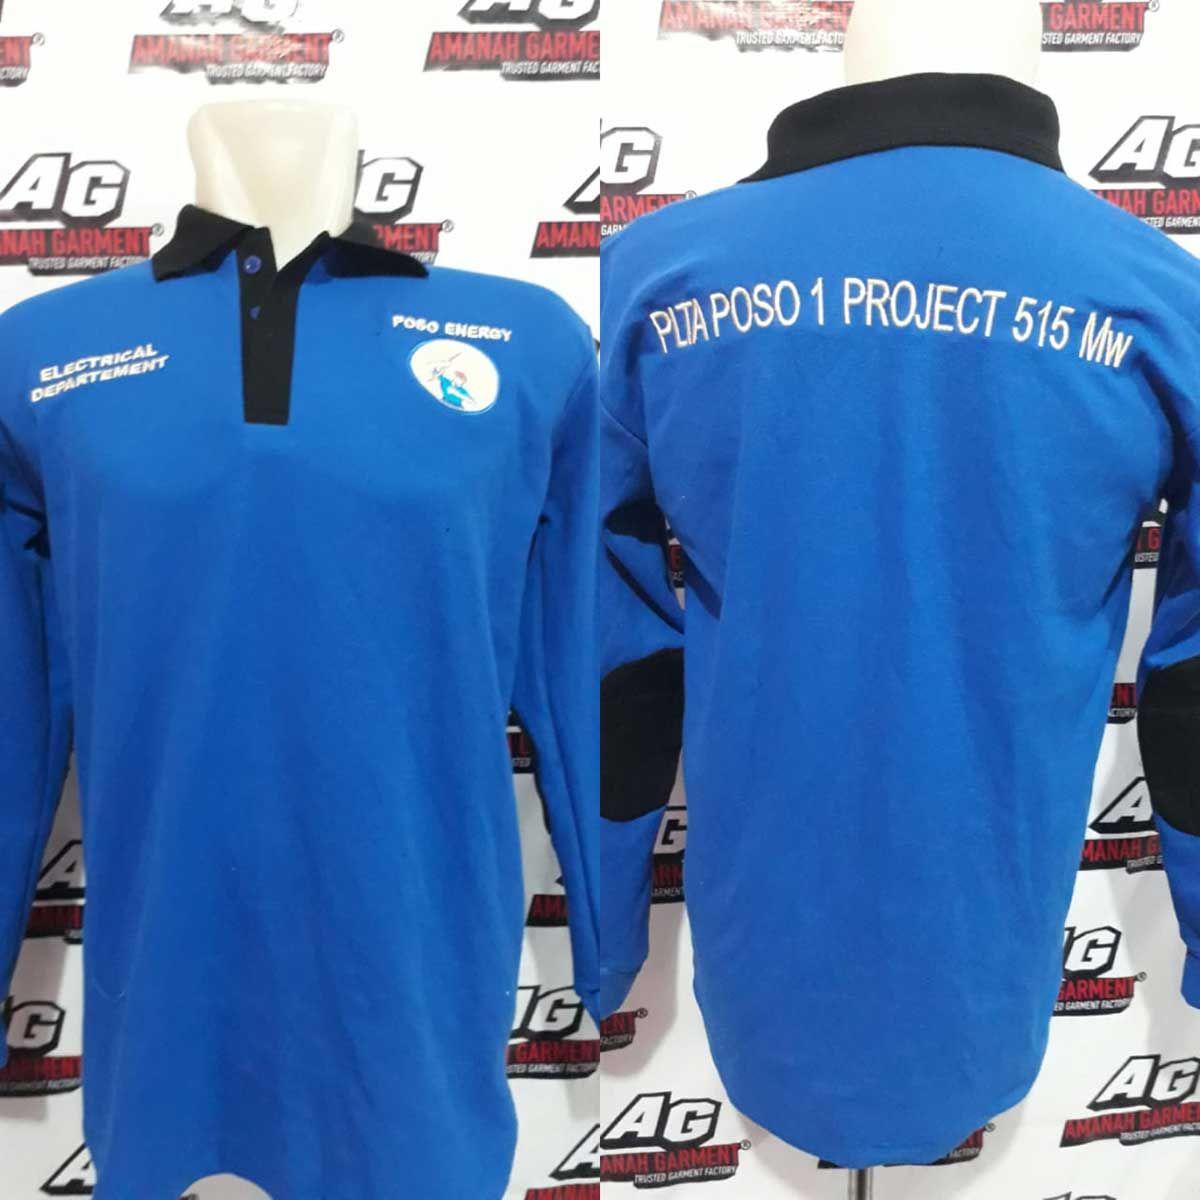 Download Image de Eau: Kerah Desain Baju Futsal Berkerah